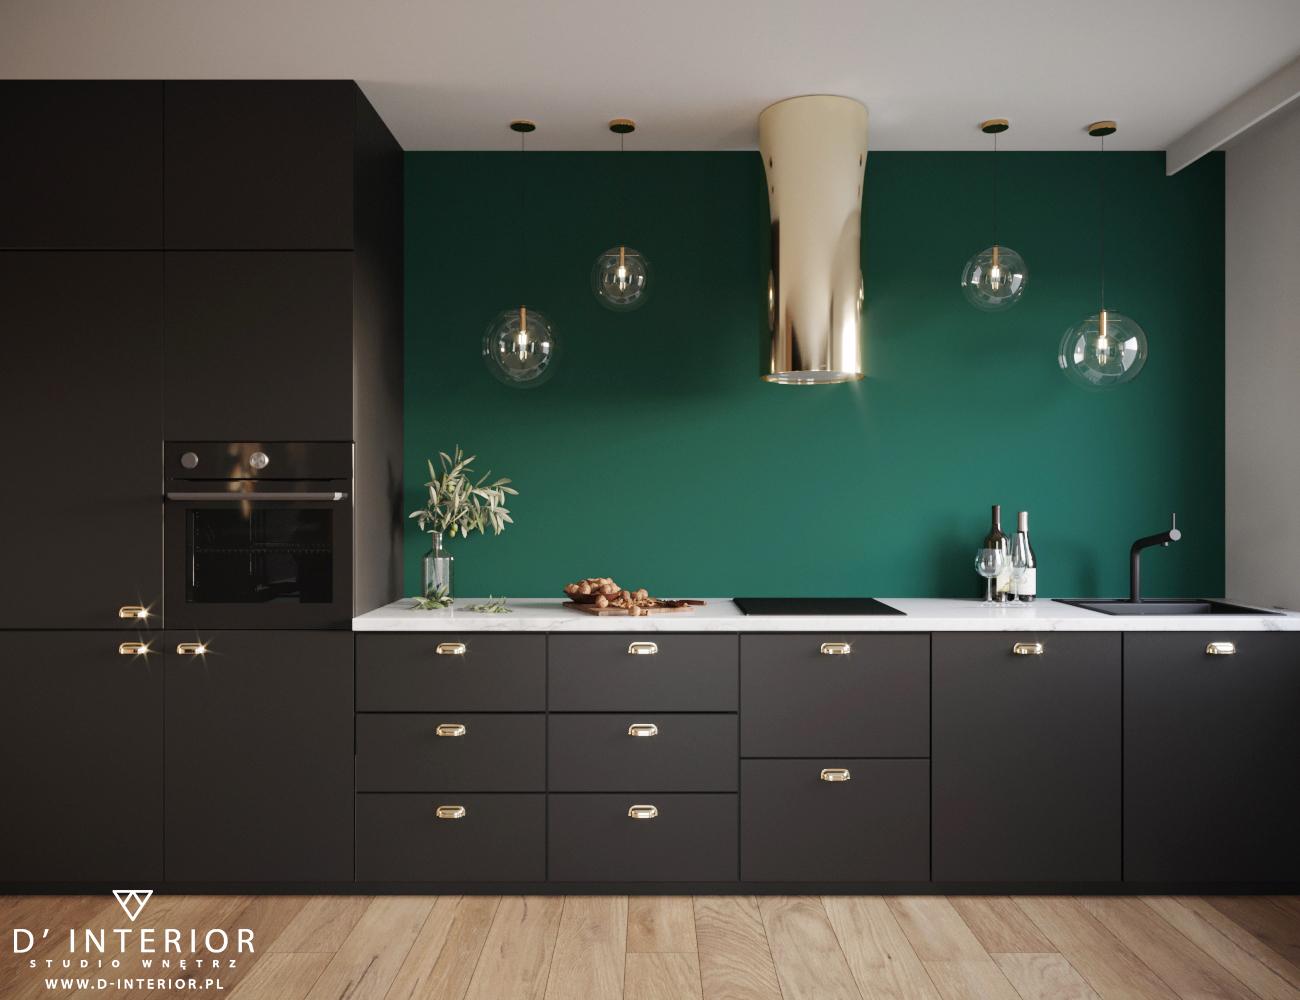 Projekt kuchni czarno zielonej